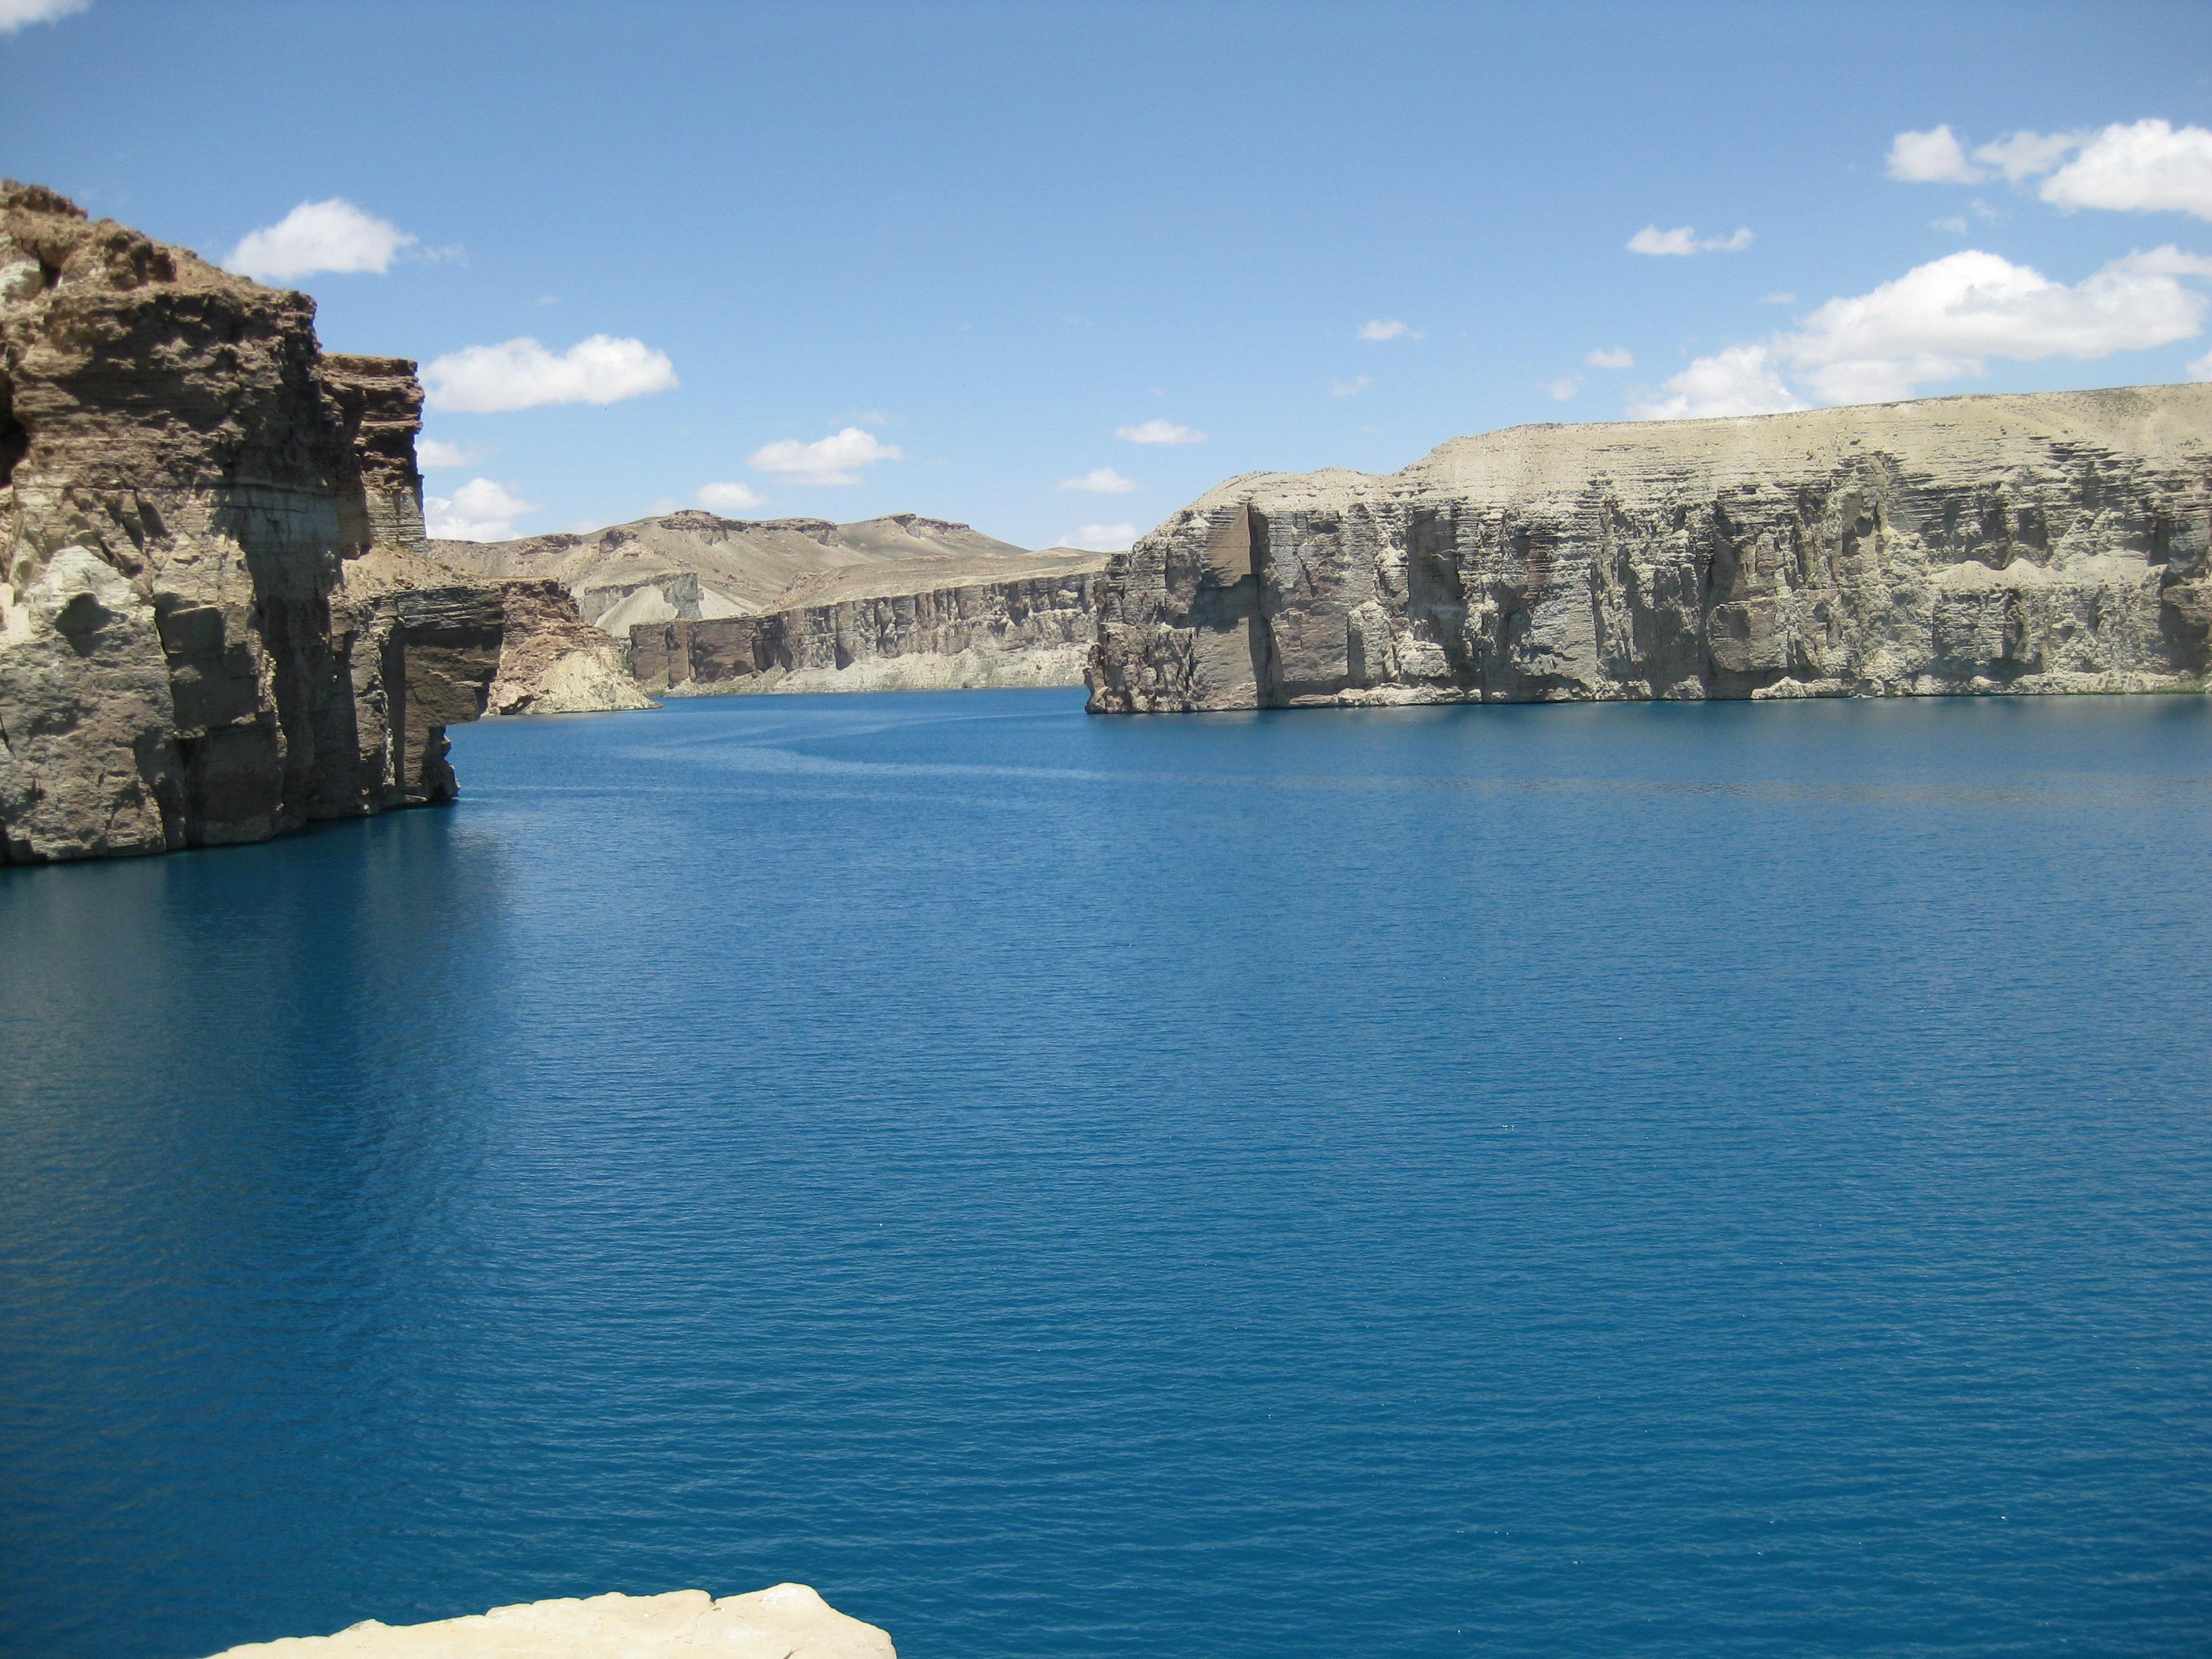 File:Band-e-Amir National Park-12.jpg - Wikimedia Commons